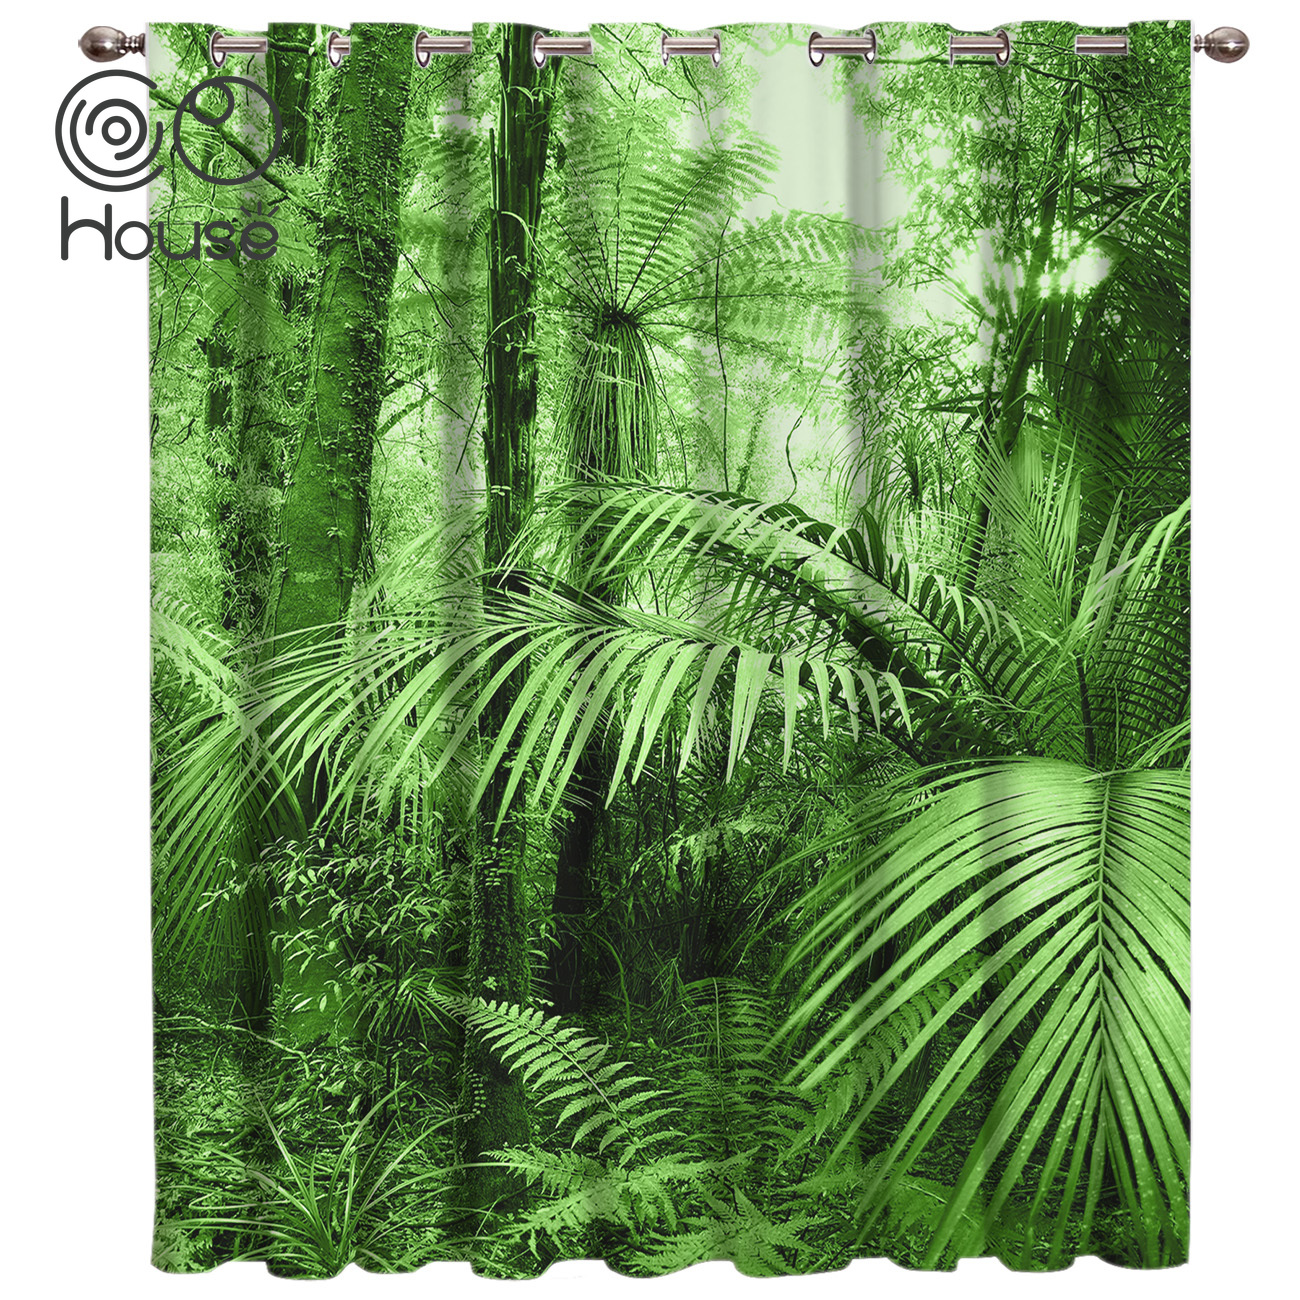 Green Bush Forest Scenery Room Curtains Large Window Window Curtains Dark Living Room Bathroom Outdoor Indoor